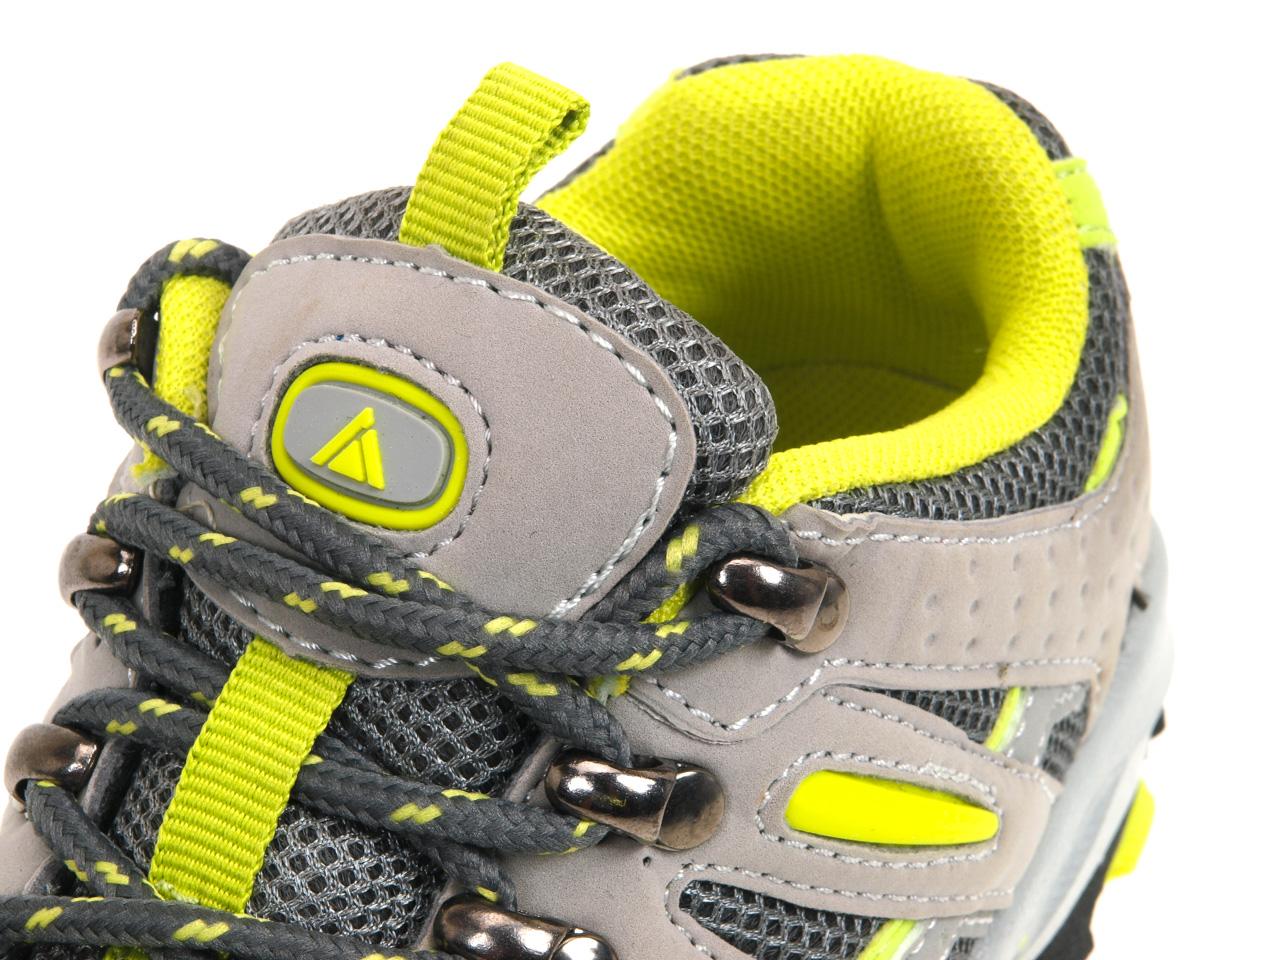 Chaussures-marche-randonnees-Lhoste-Camelia-anthracite-jr-Gris-61105-Neuf